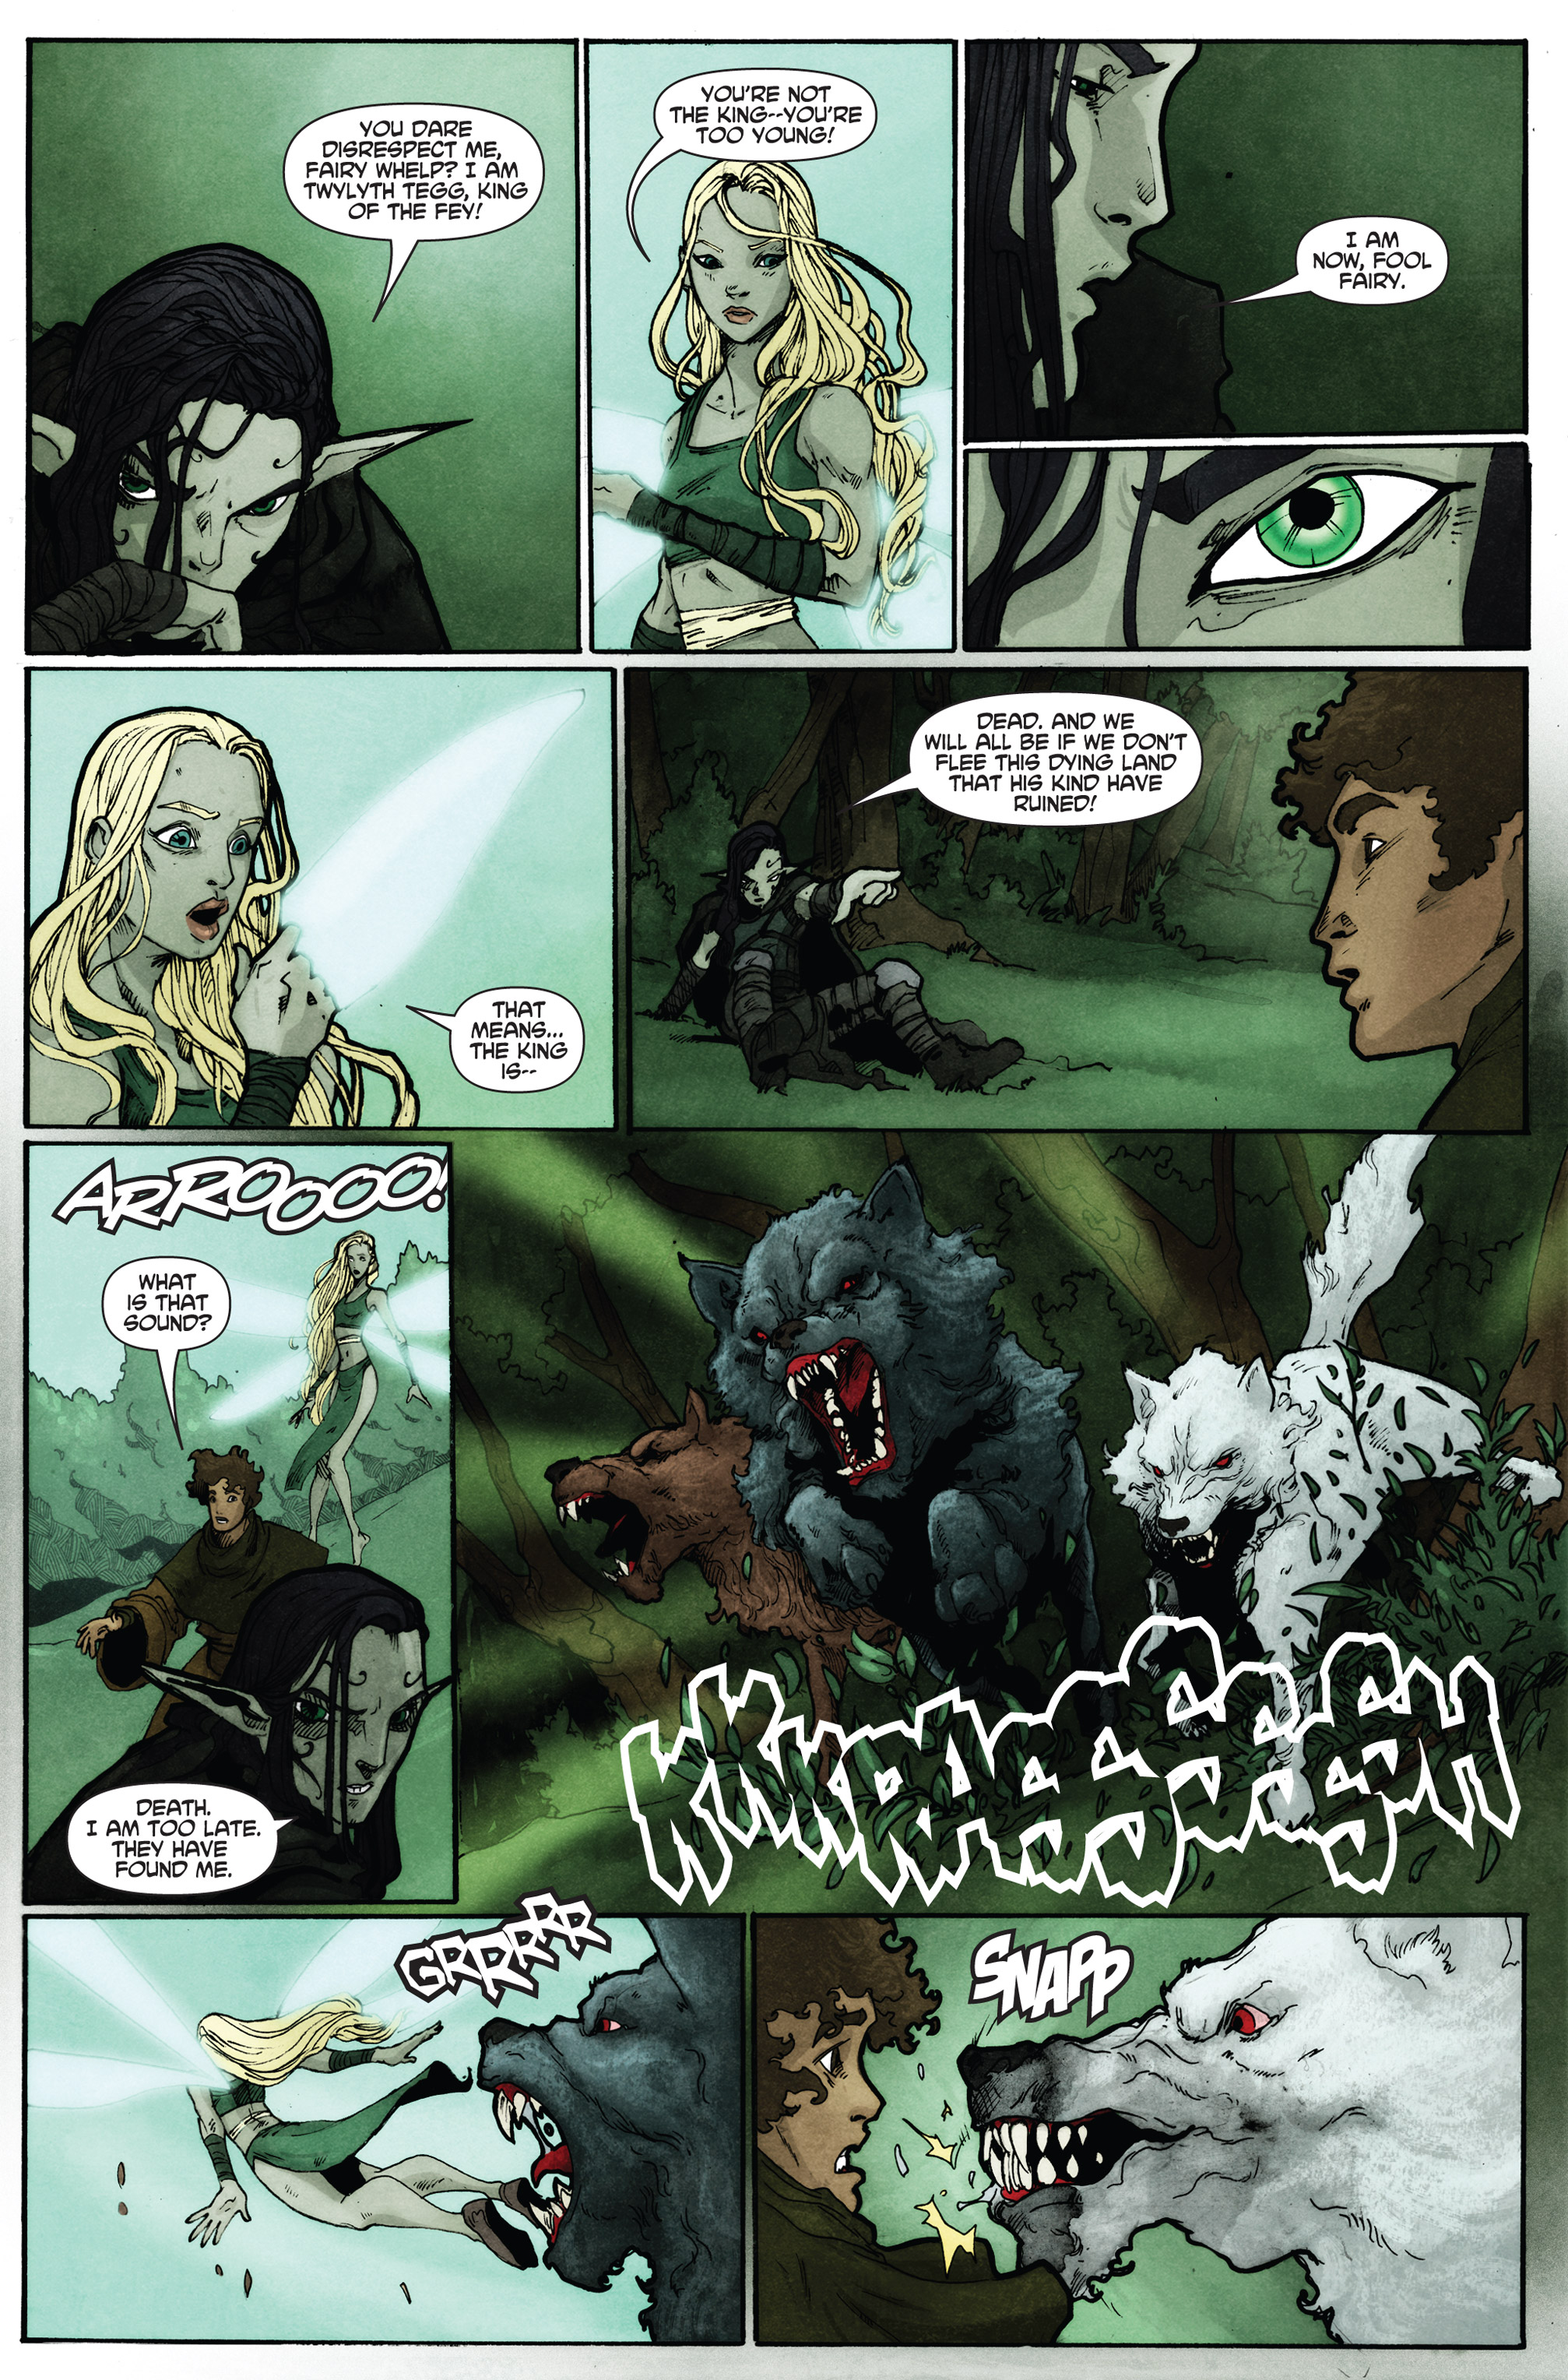 Read online Plague comic -  Issue #2 - 12